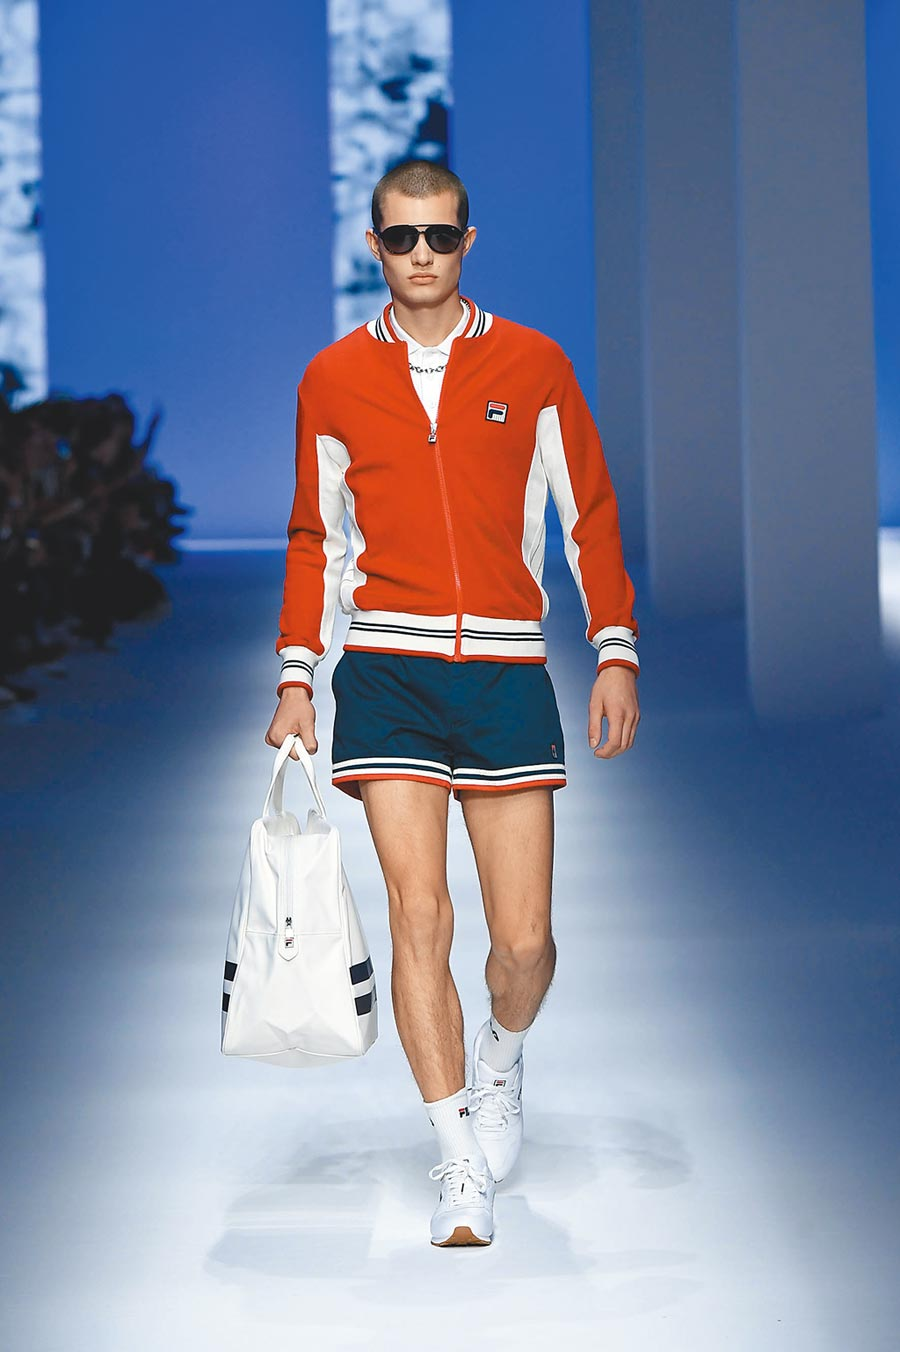 FILA於1970年代,贊助眾多頂尖網球選手,其中以傳奇「歐洲大滿貫之王」比約恩博格的專屬服裝,最為知名。(FILA提供)